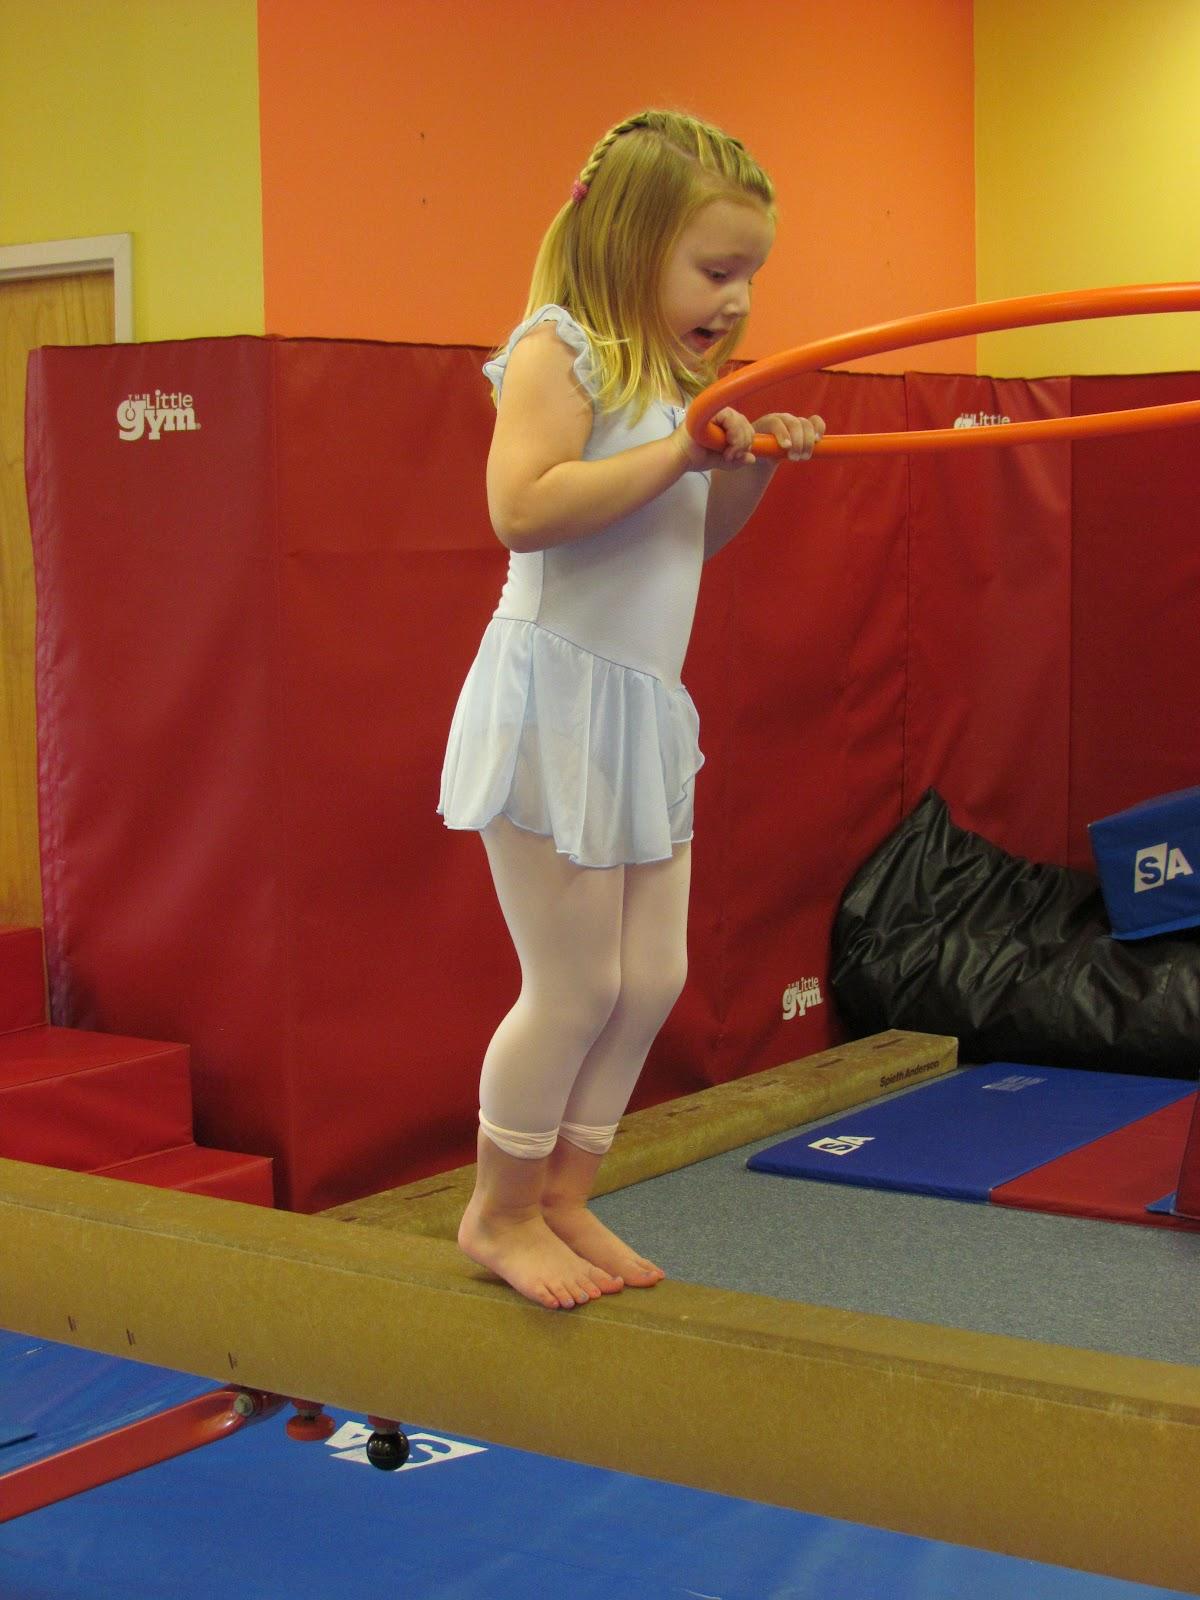 Little Girl Gymnastic Class Little Girl Gymnastic Class